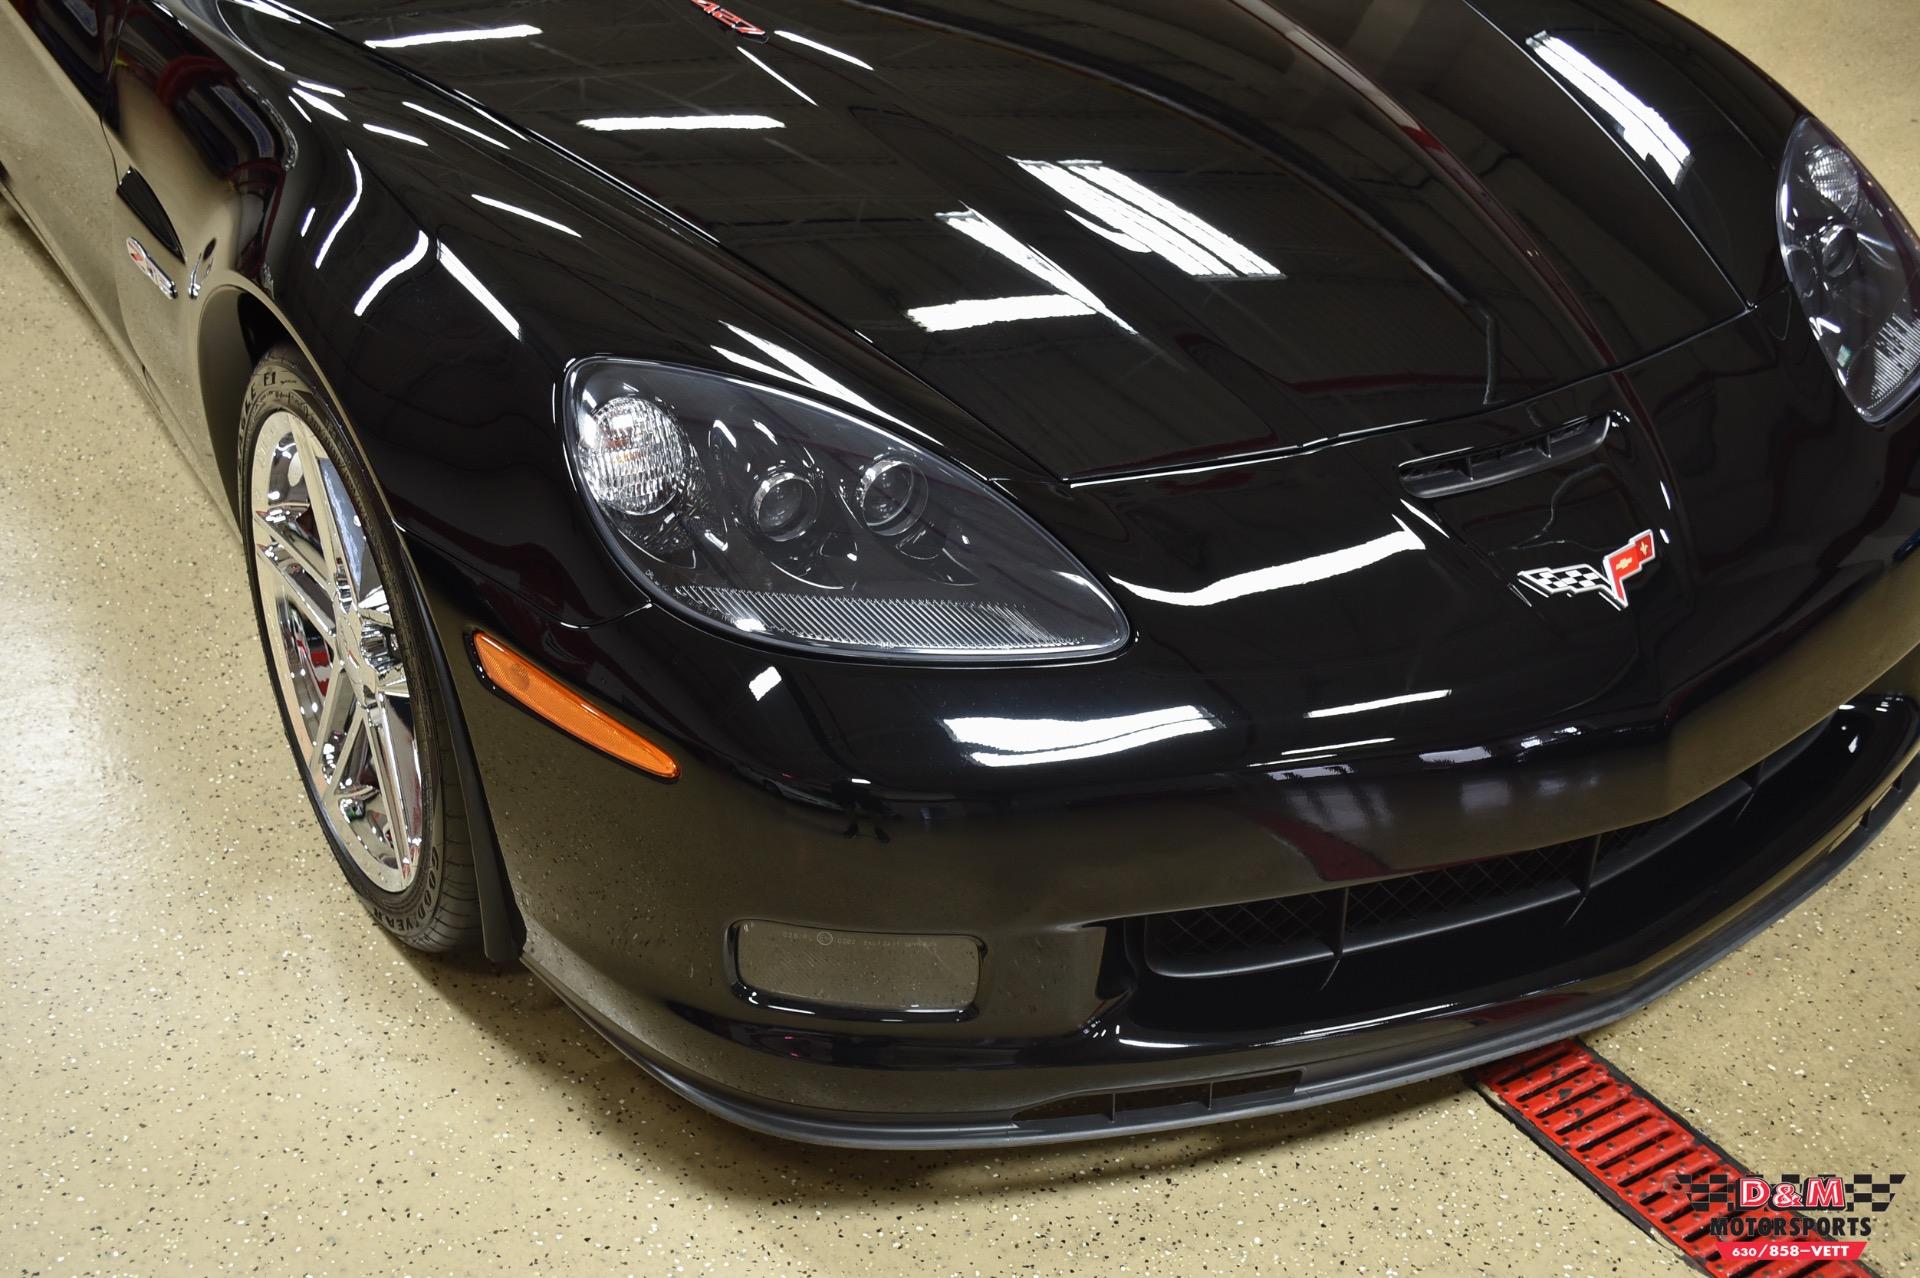 Used 2008 Chevrolet Corvette Z06 | Glen Ellyn, IL